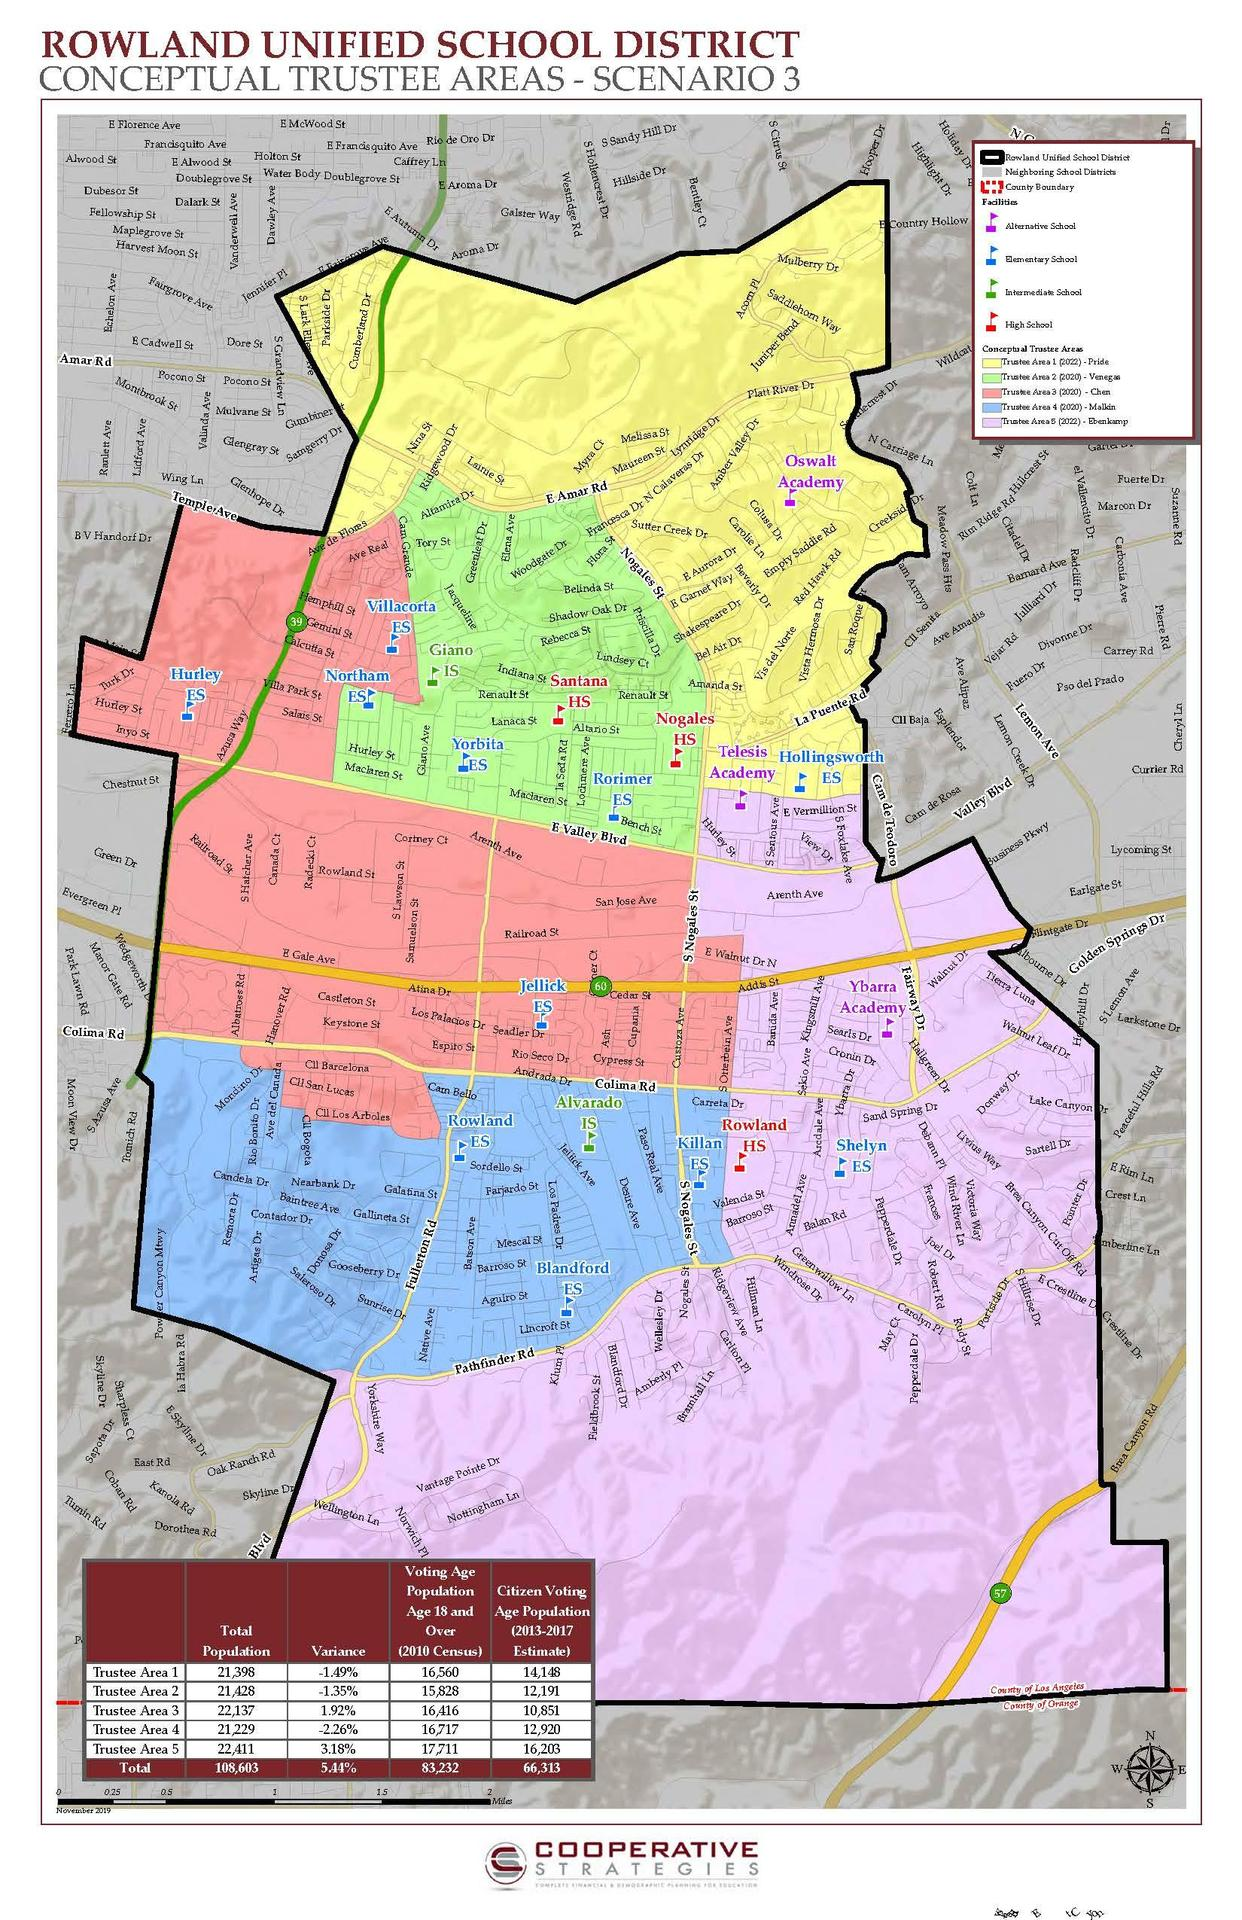 Trustee Map